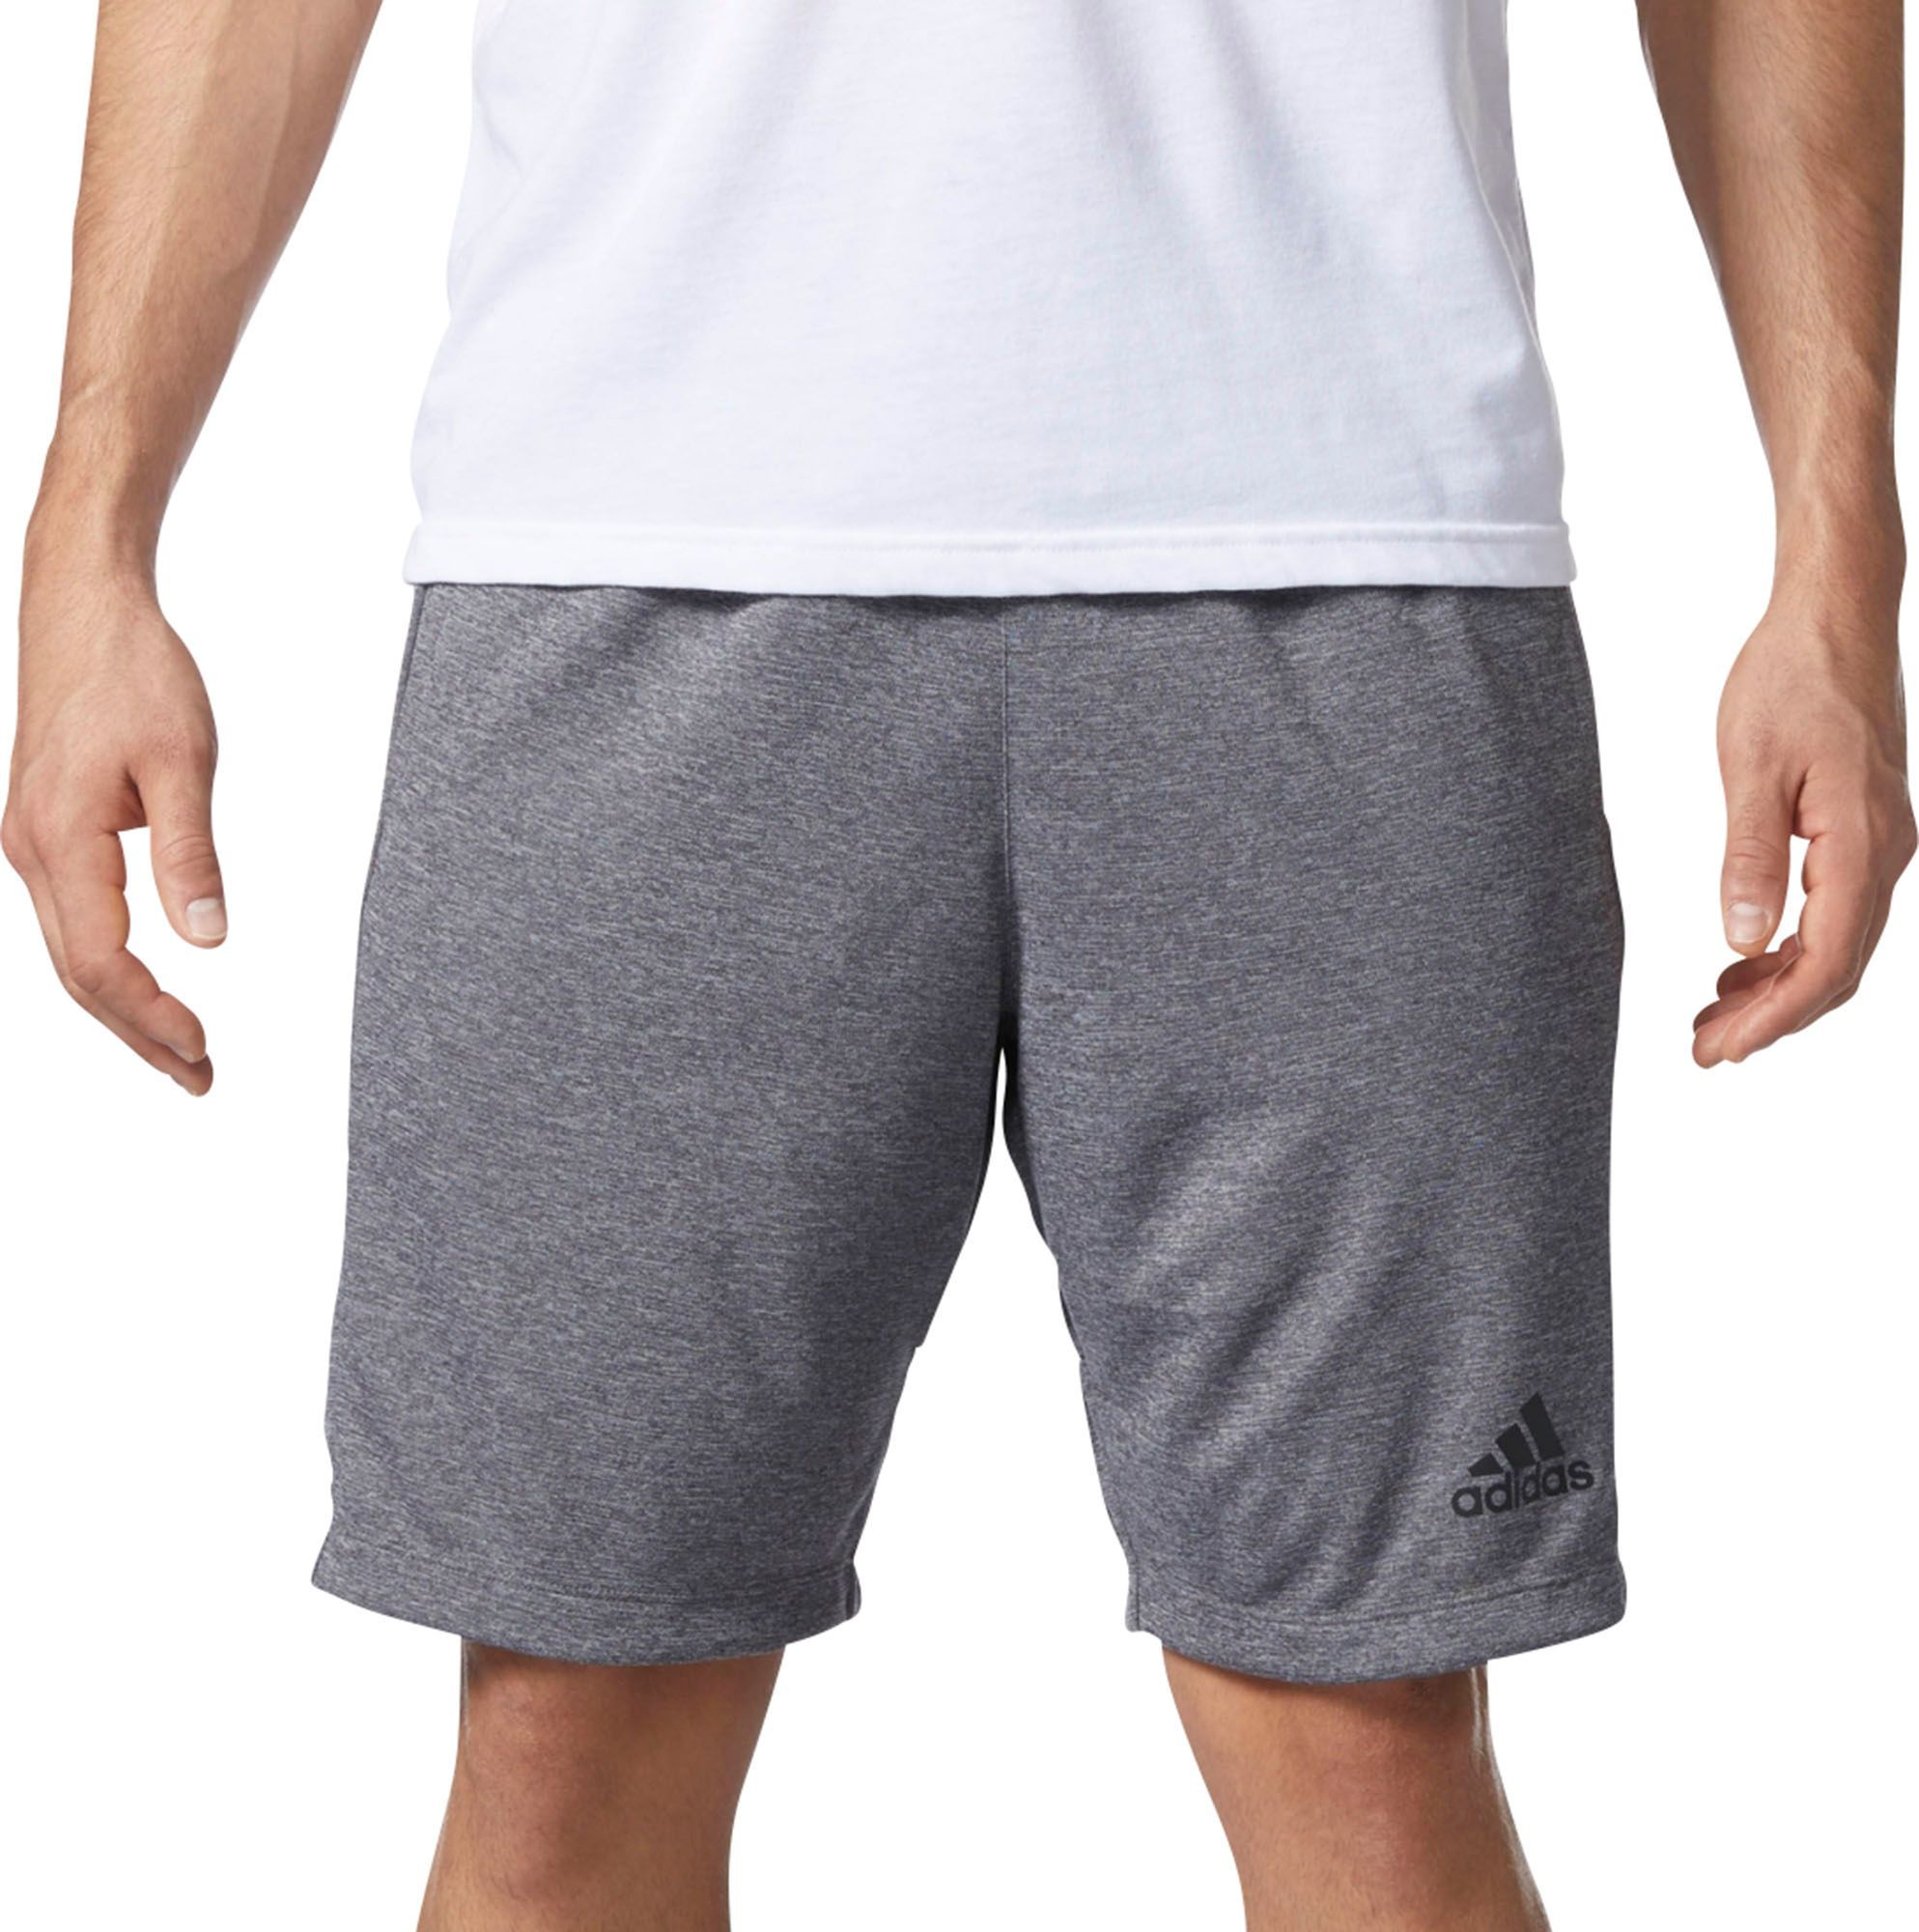 7cafd94f49 adidas Men's SpeedBreaker Hype Printed Shorts, Size: Medium, Dgh ...